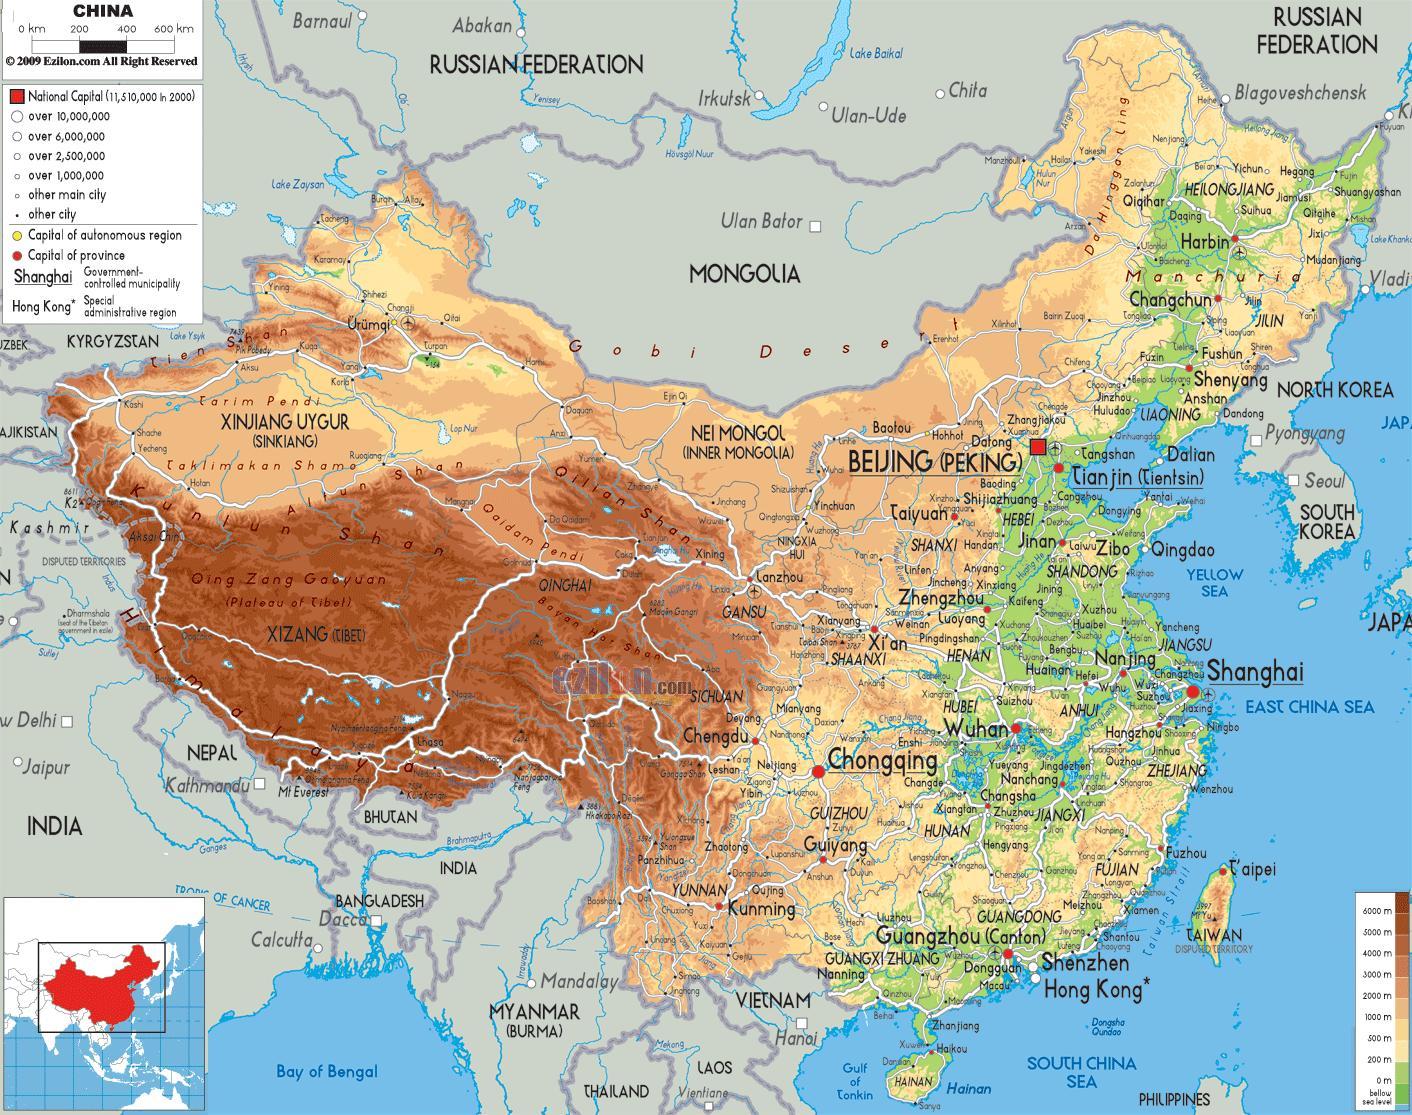 Cina Cartina Fisica Geografica.Mappa Fisica Della Cina Mappa Fisica Cina Asia Orientale